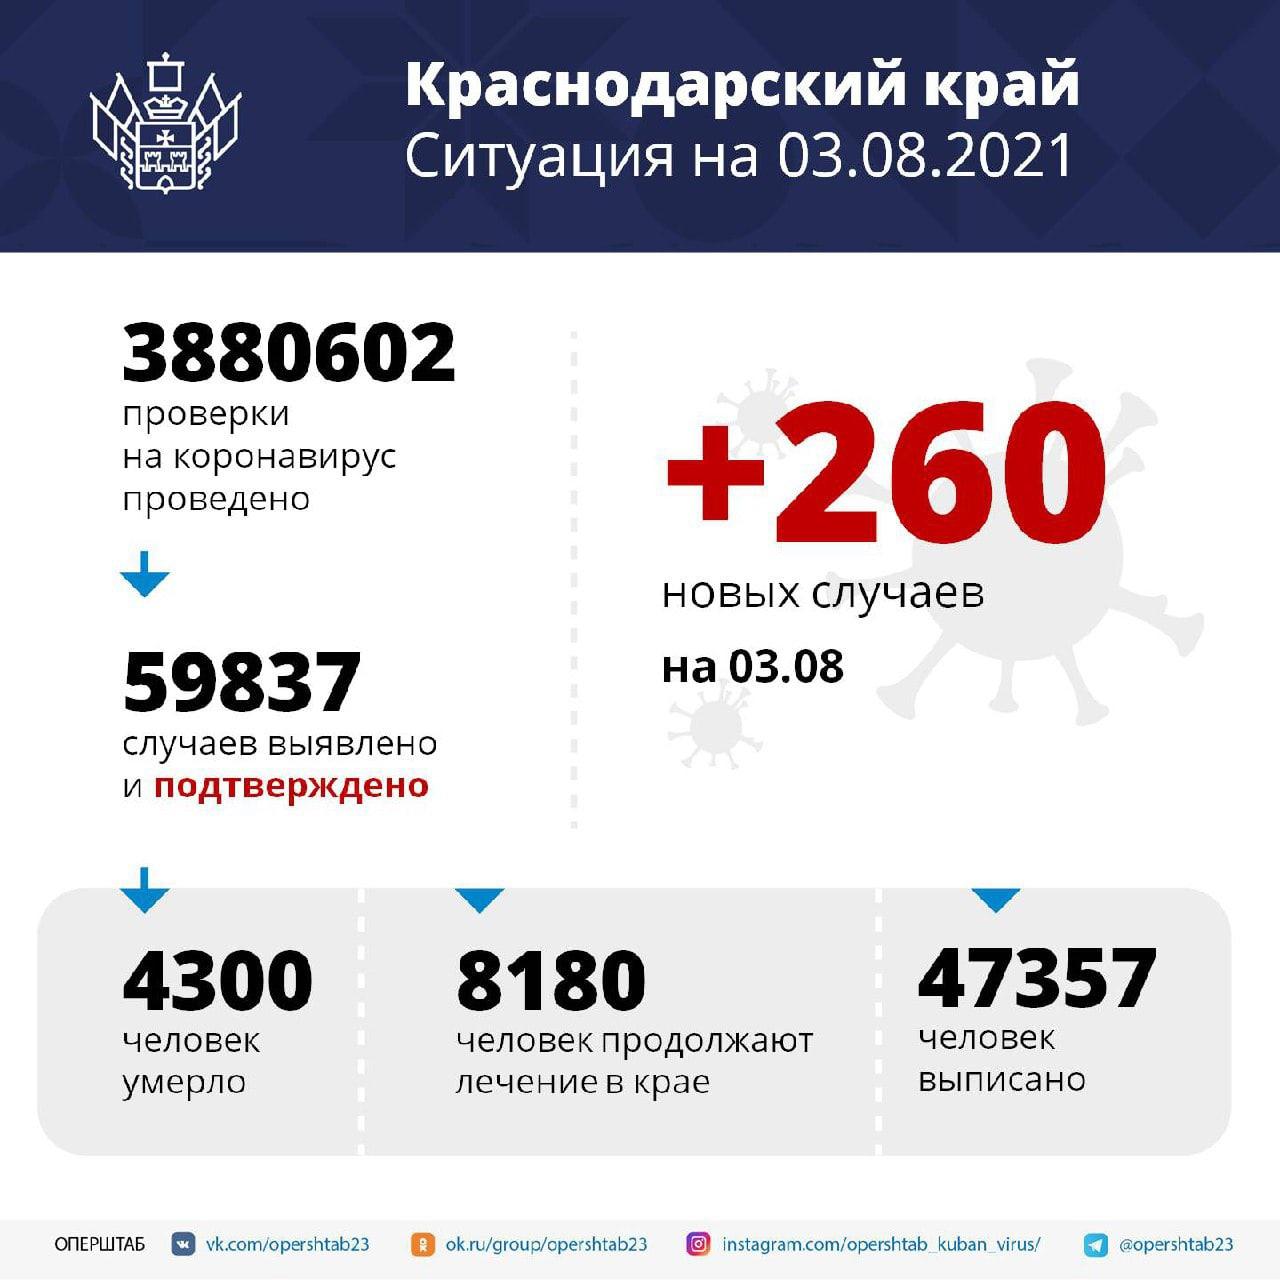 На Кубани за сутки зарегистрировали 260 случаев COVID-19Заболевших...